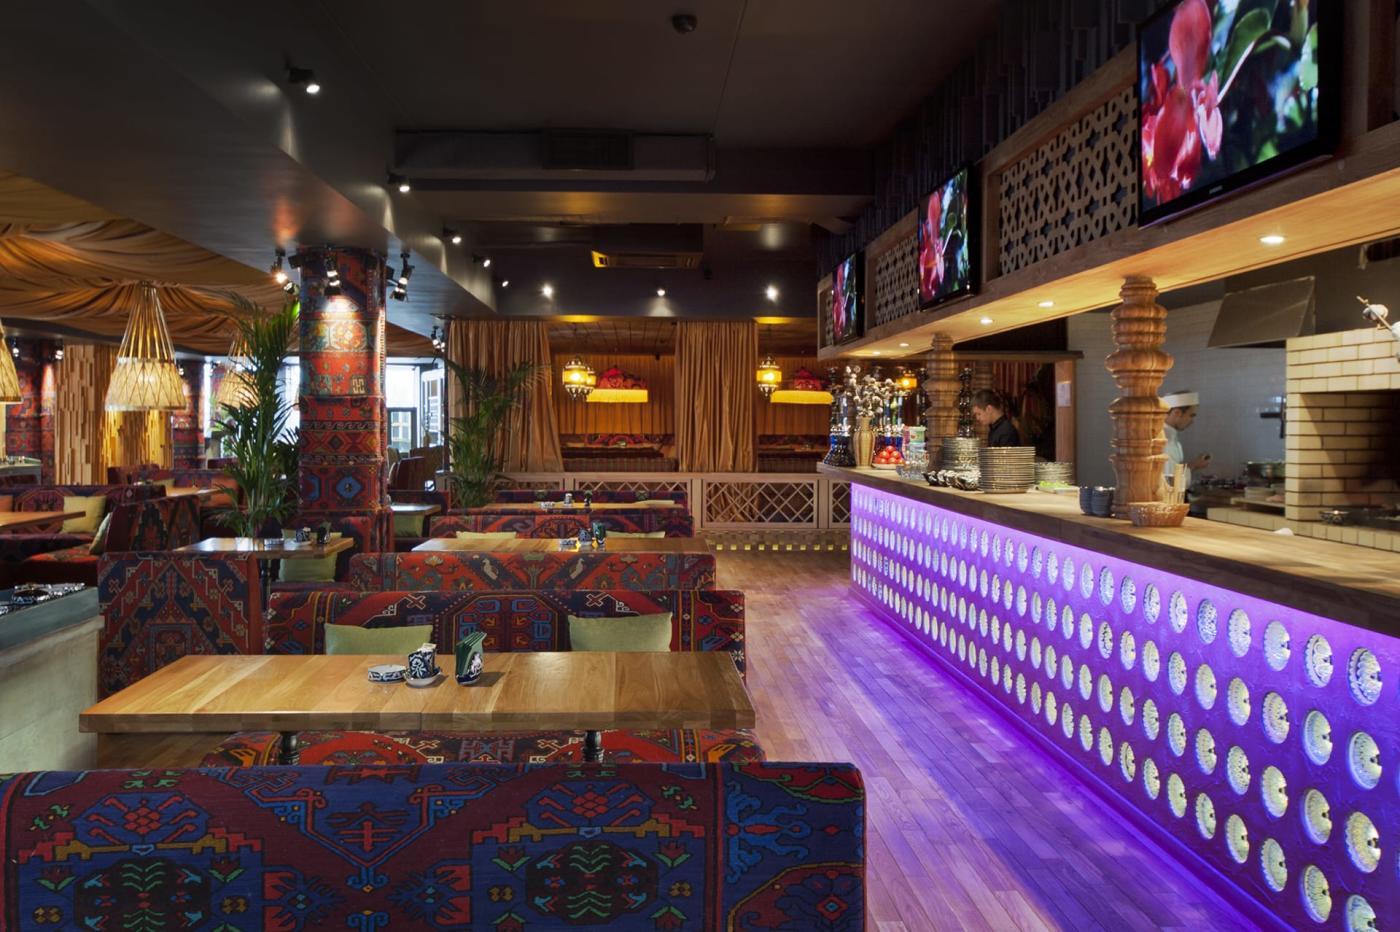 Ресторан Тапчан Площадь Ильича (Римская / Сергия Радонежского - Топчан) фото 8